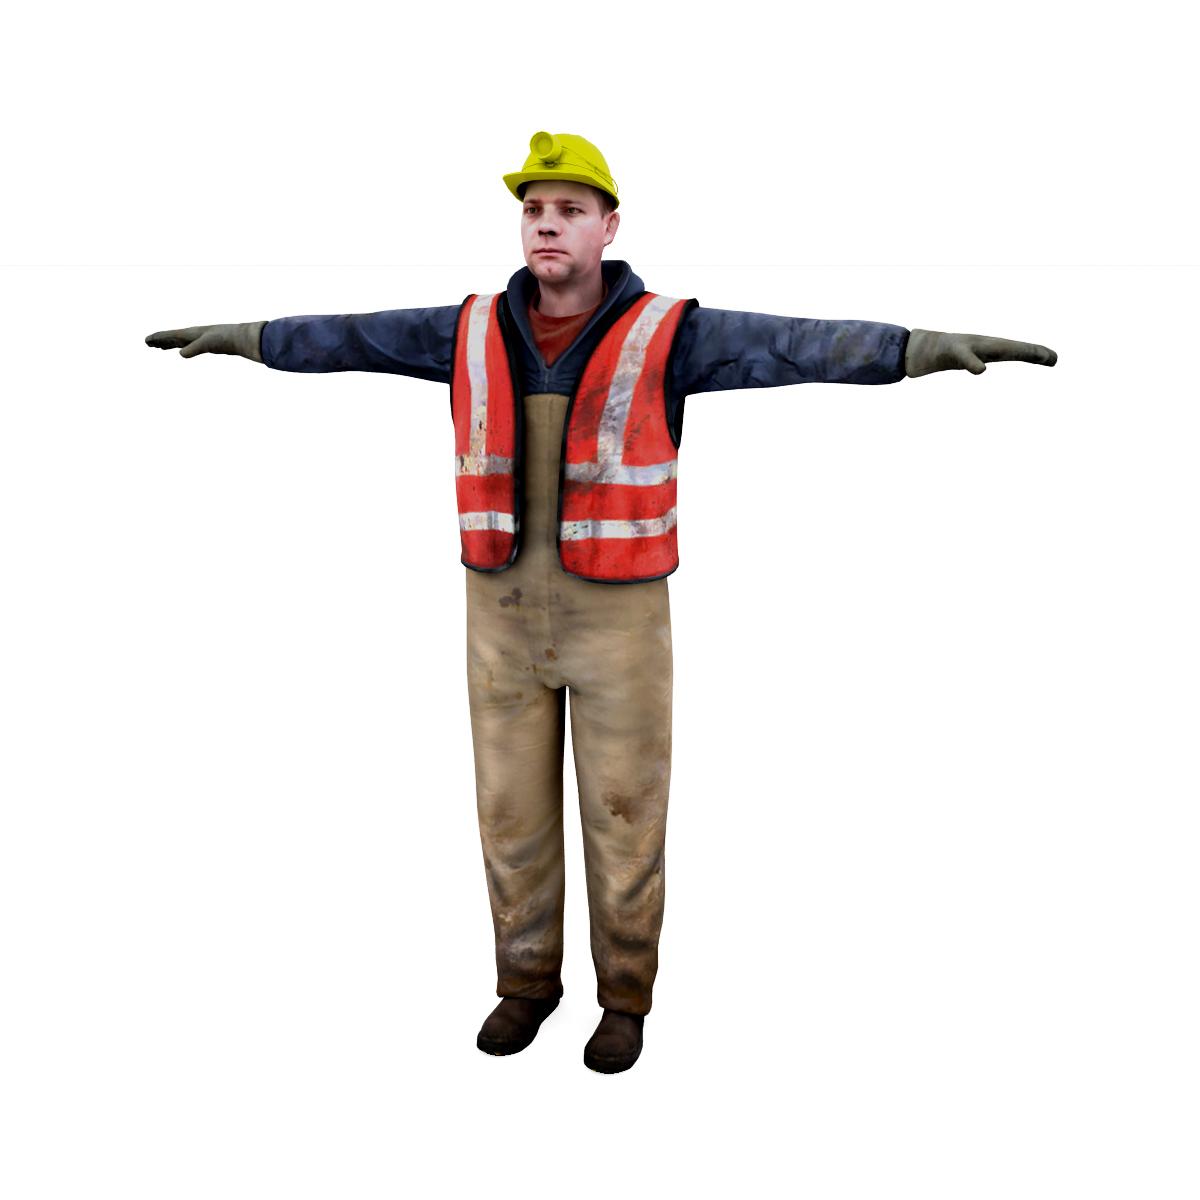 male worker 3d model 3ds max fbx obj 293884 ec9888f5c27d